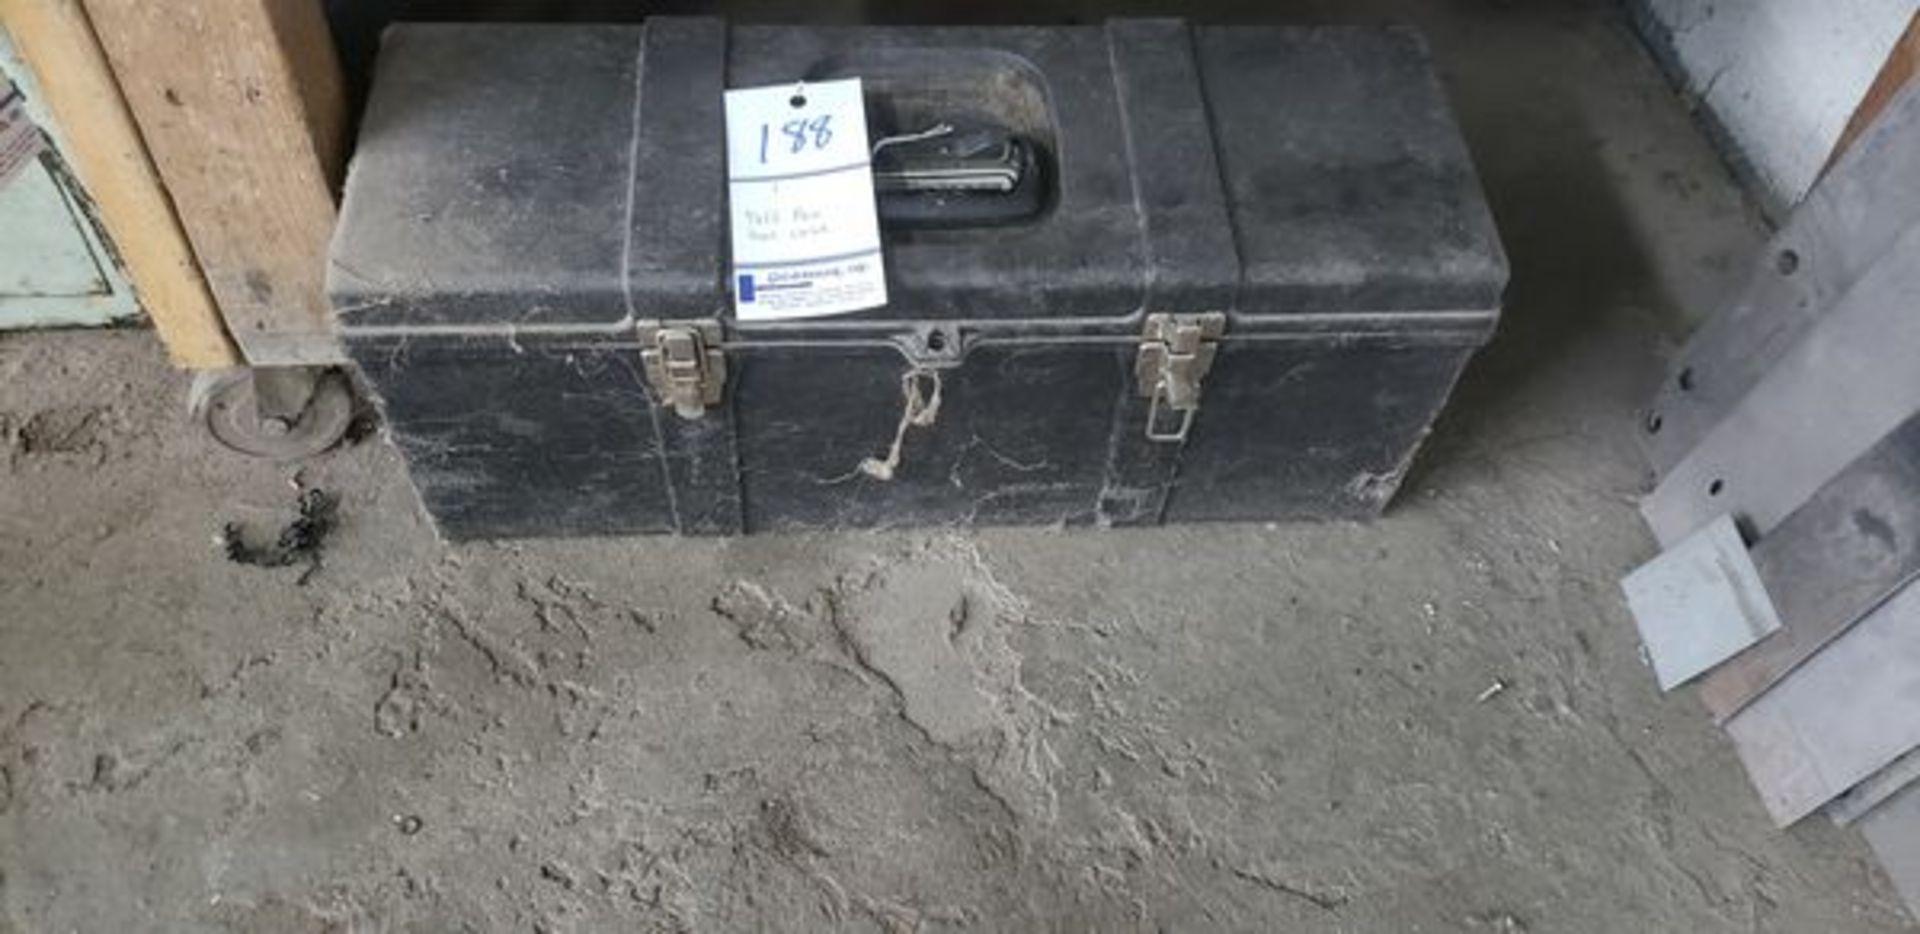 TUFF BOX TOOL CASE